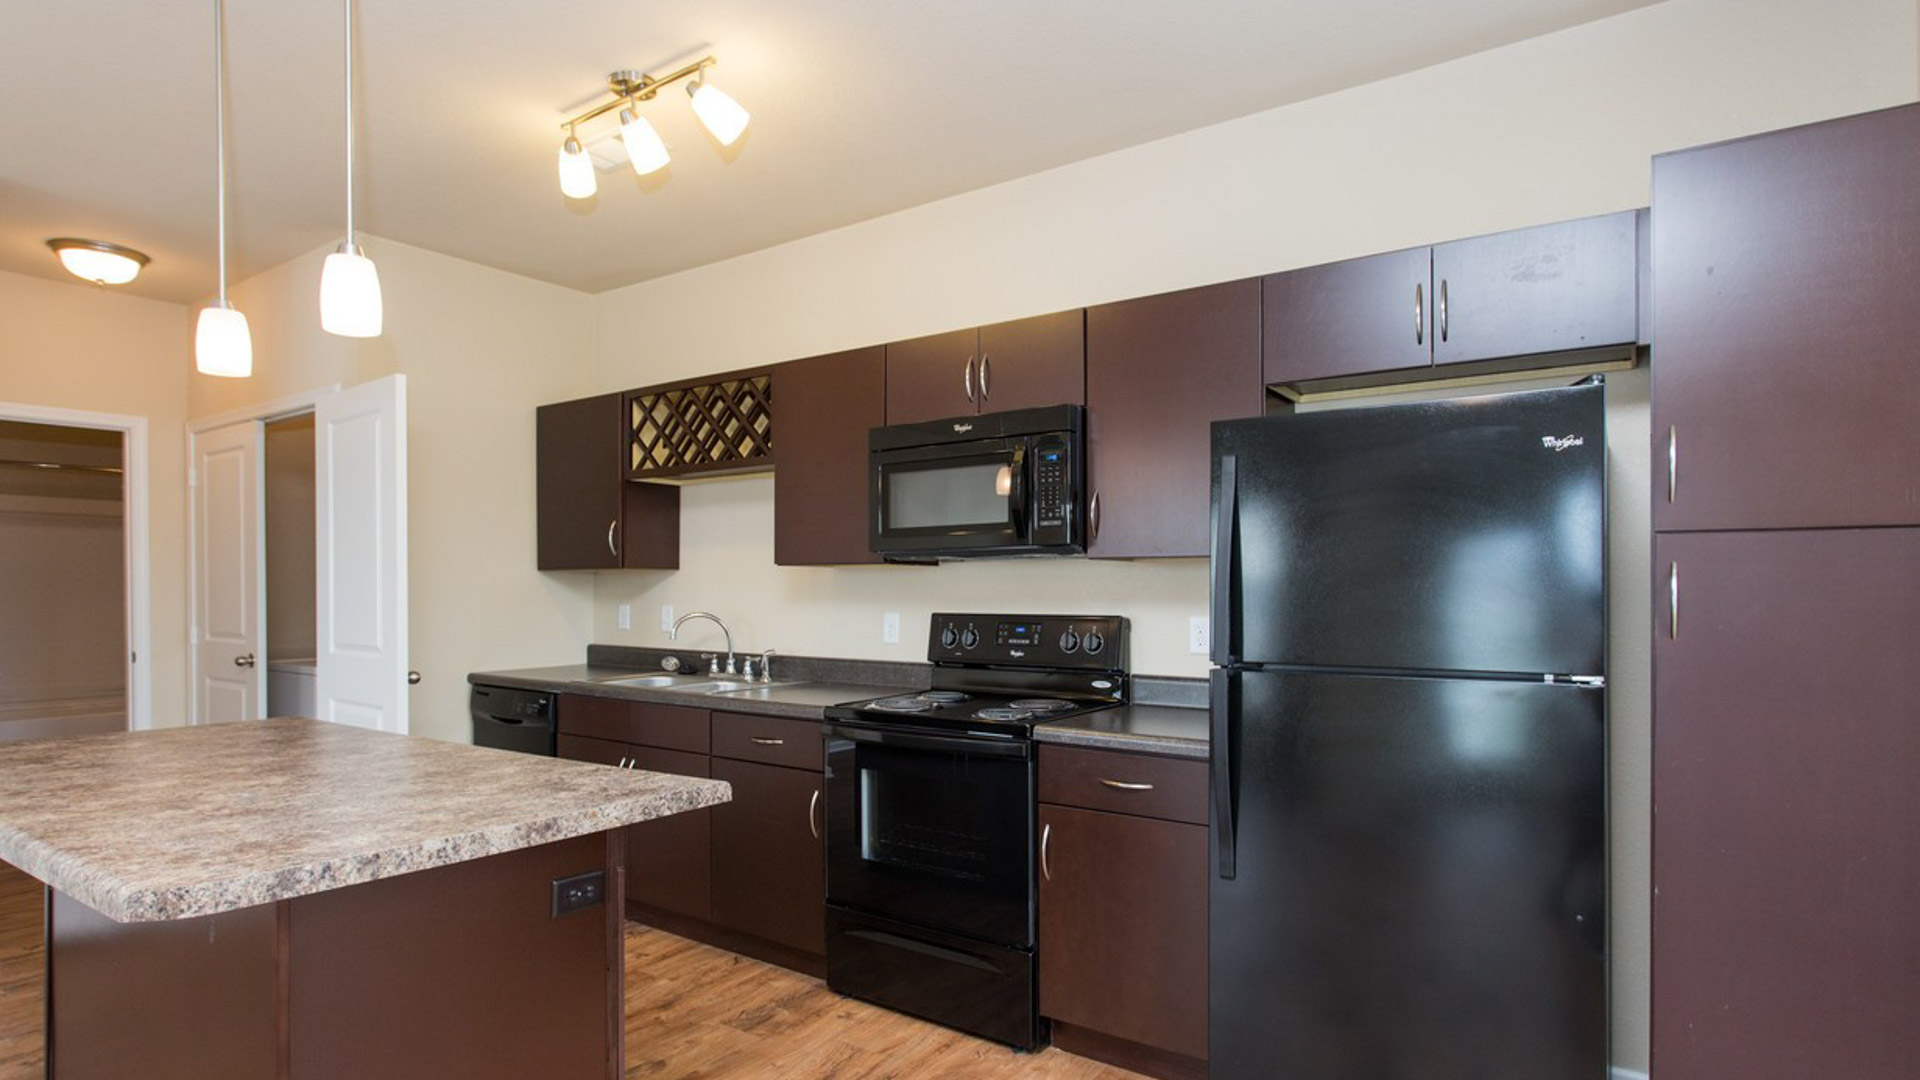 Kitchen in Savage MN at Springs at Egan Drive Apartments-7